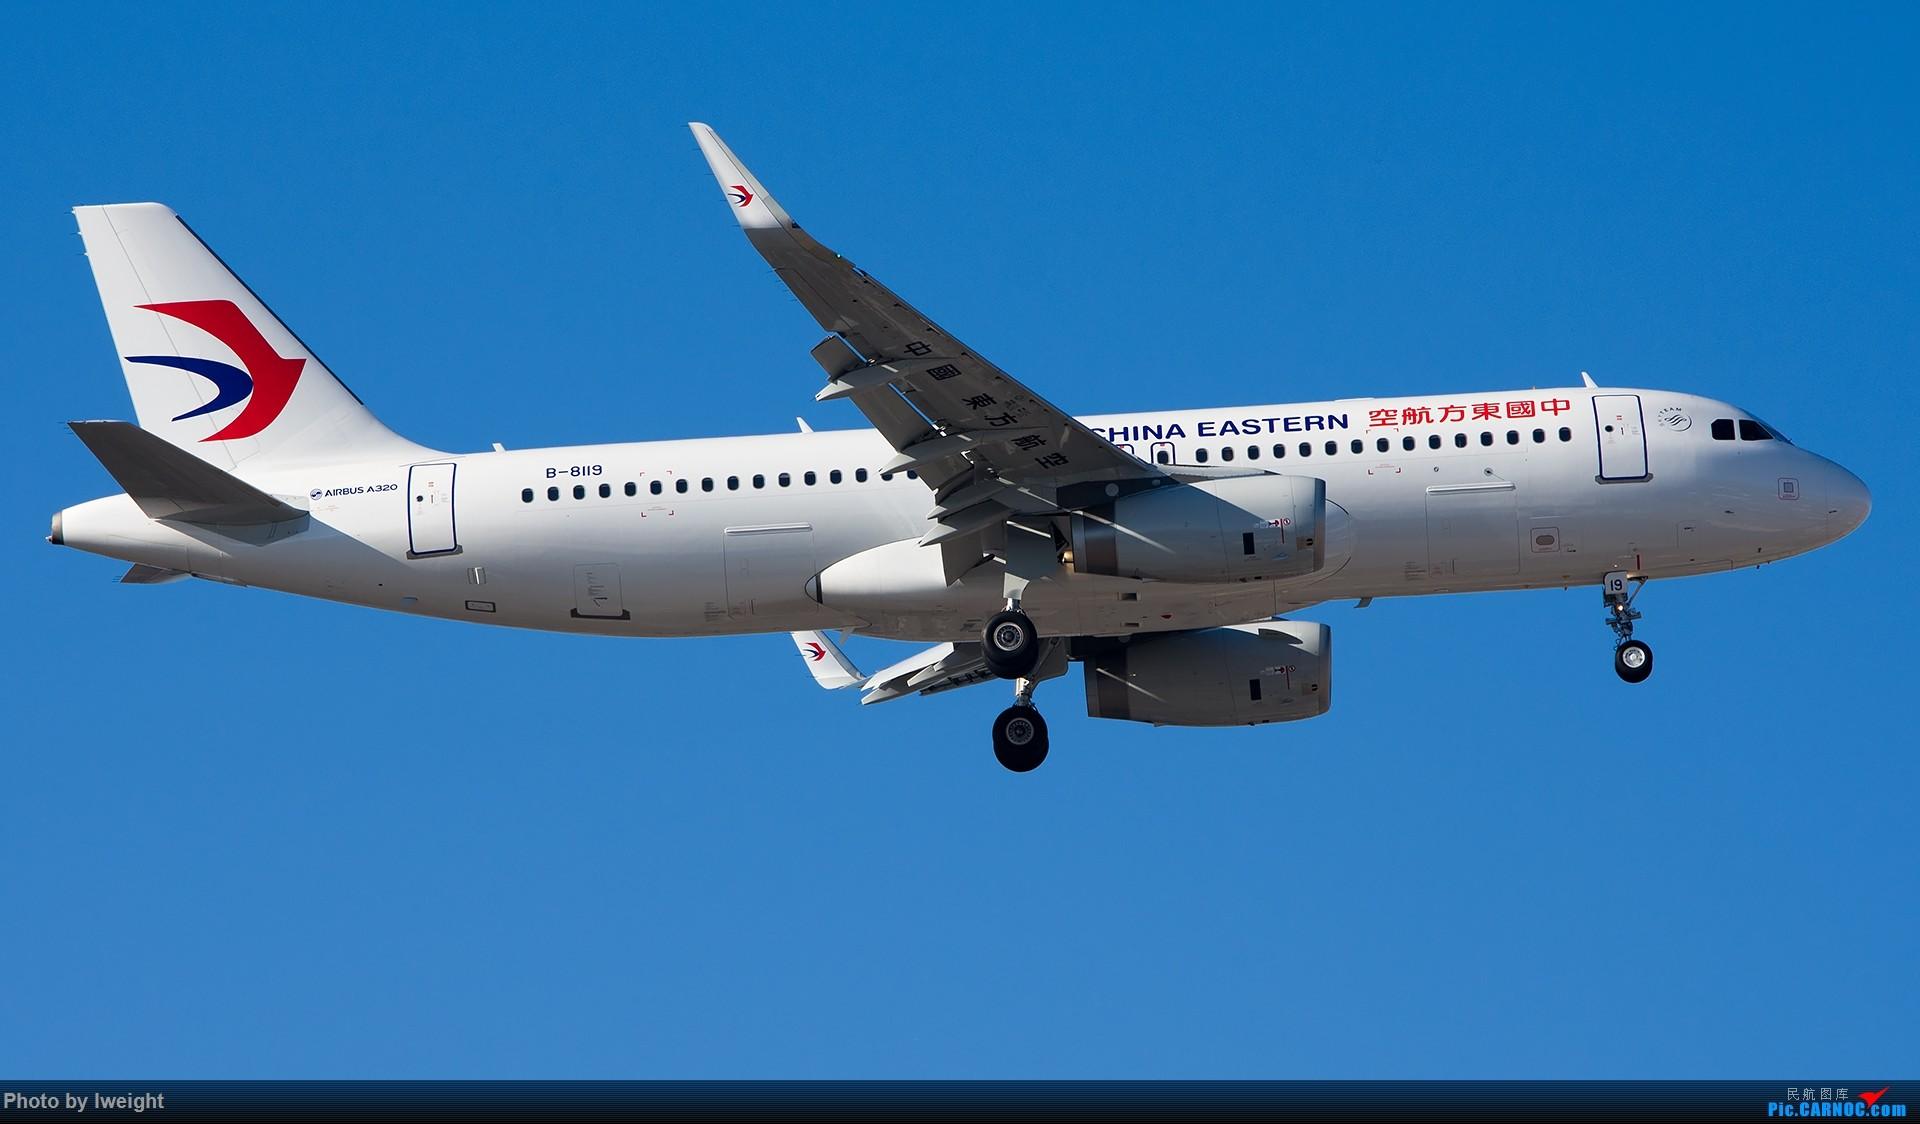 Re:[原创]终于在12月的北京等到了一个晴天的周末,出来拍拍飞机【2015-12-5】 AIRBUS A320-200 B-8119 中国北京首都国际机场